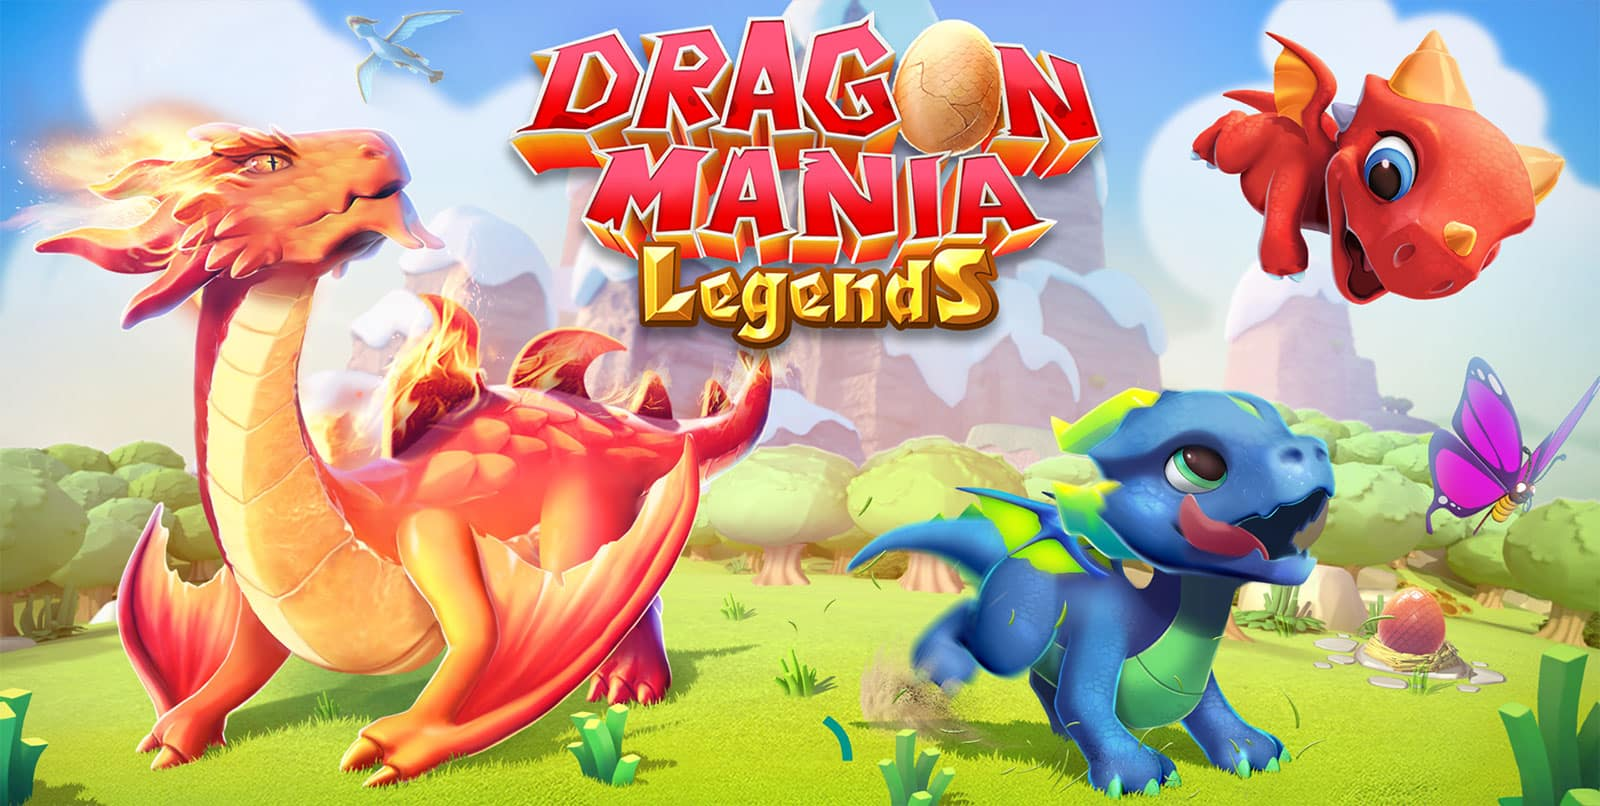 Dragon-Mania-Legends-Mod-Apk